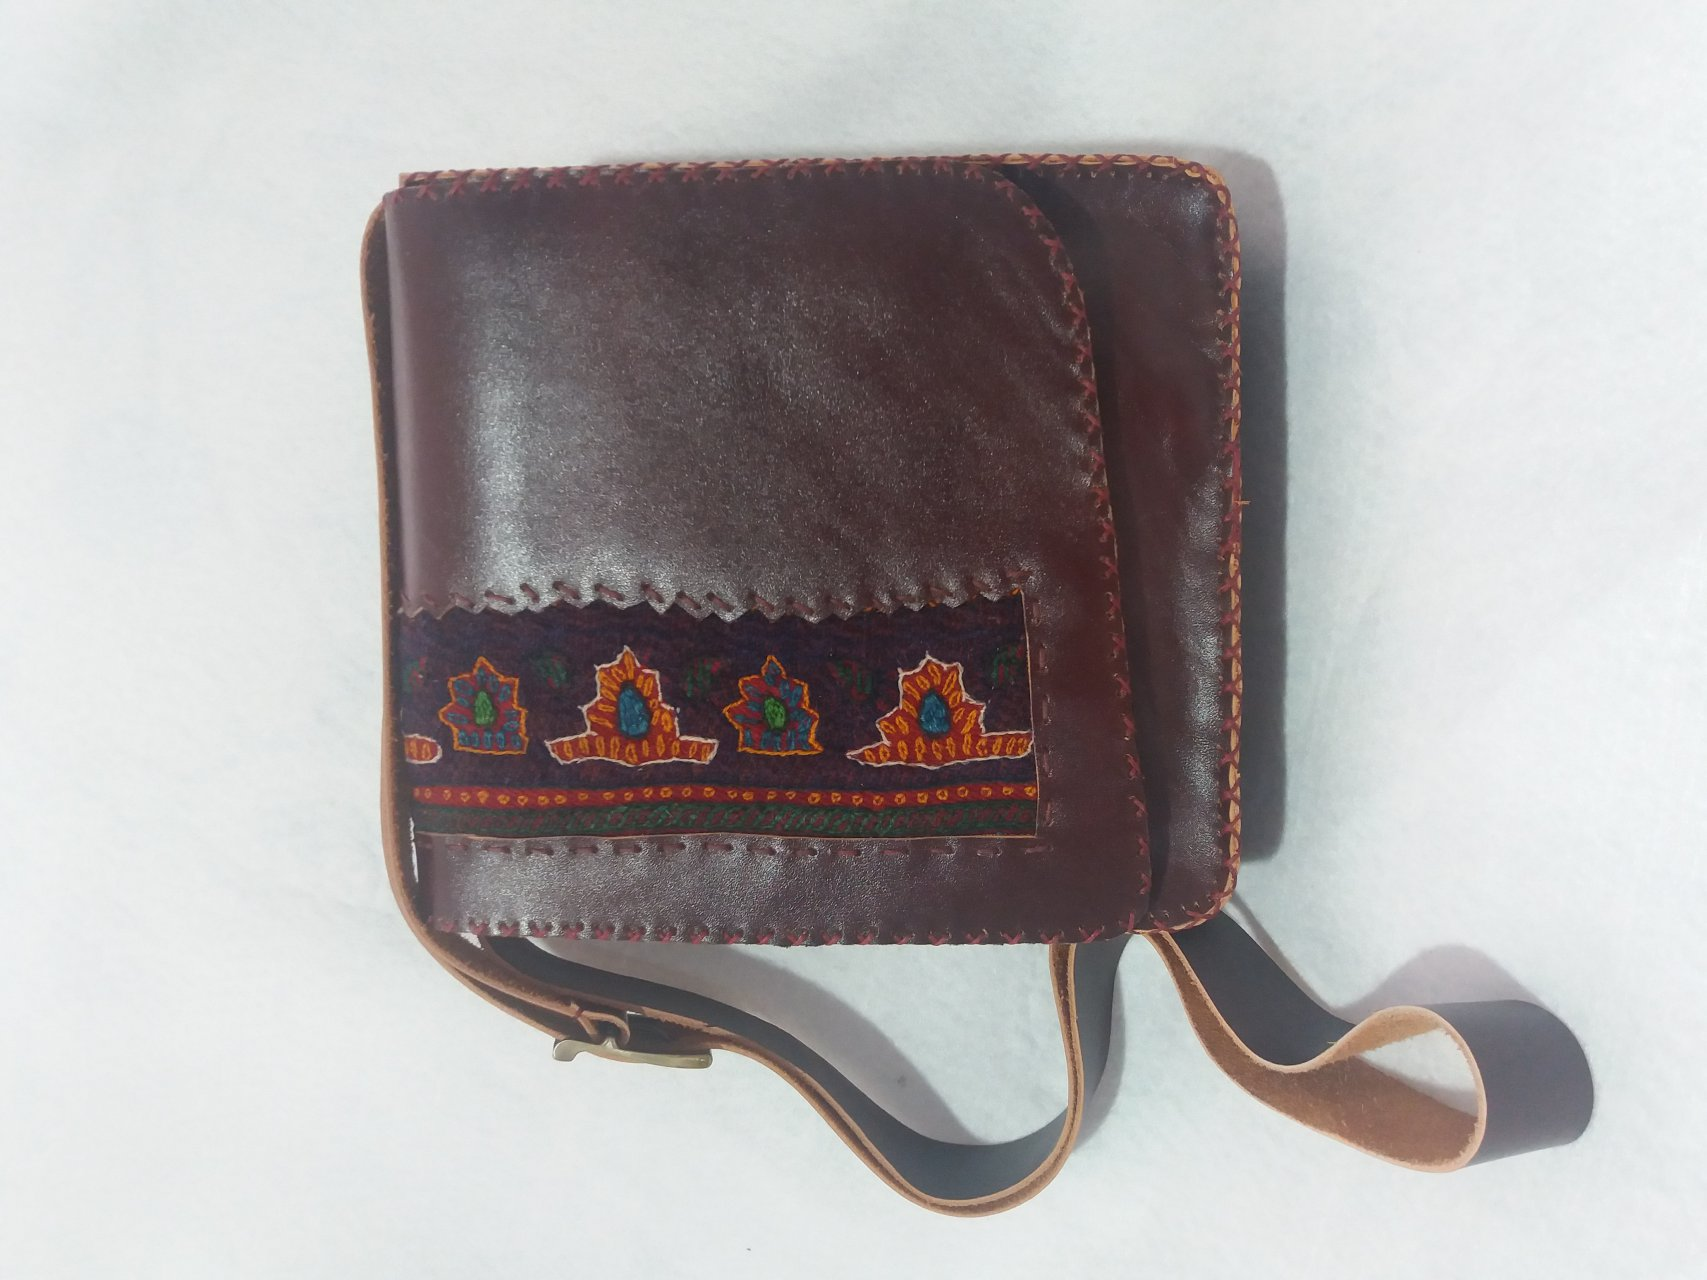 کیف چرم طبیعی دستدوز زنانه با ترکیب پته